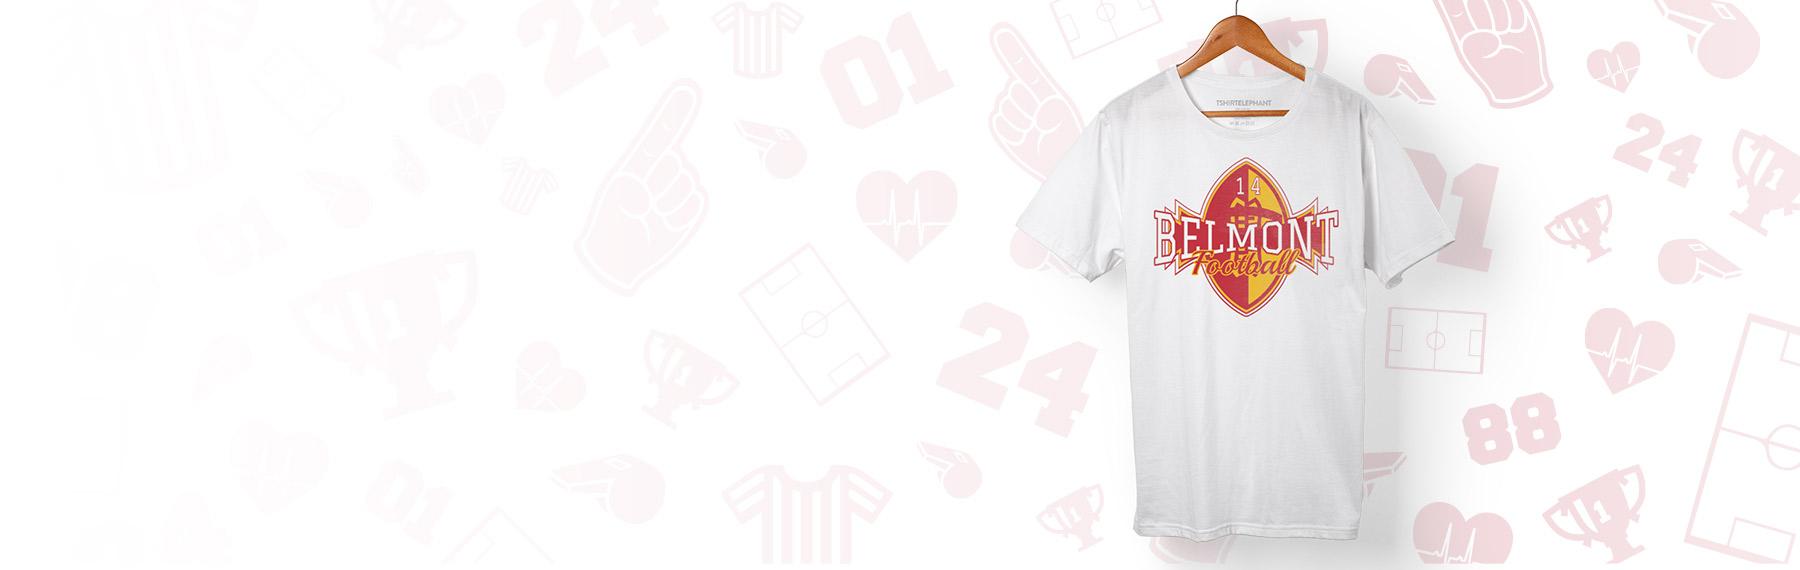 Custom Football Team T Shirts Jerseys Design Online